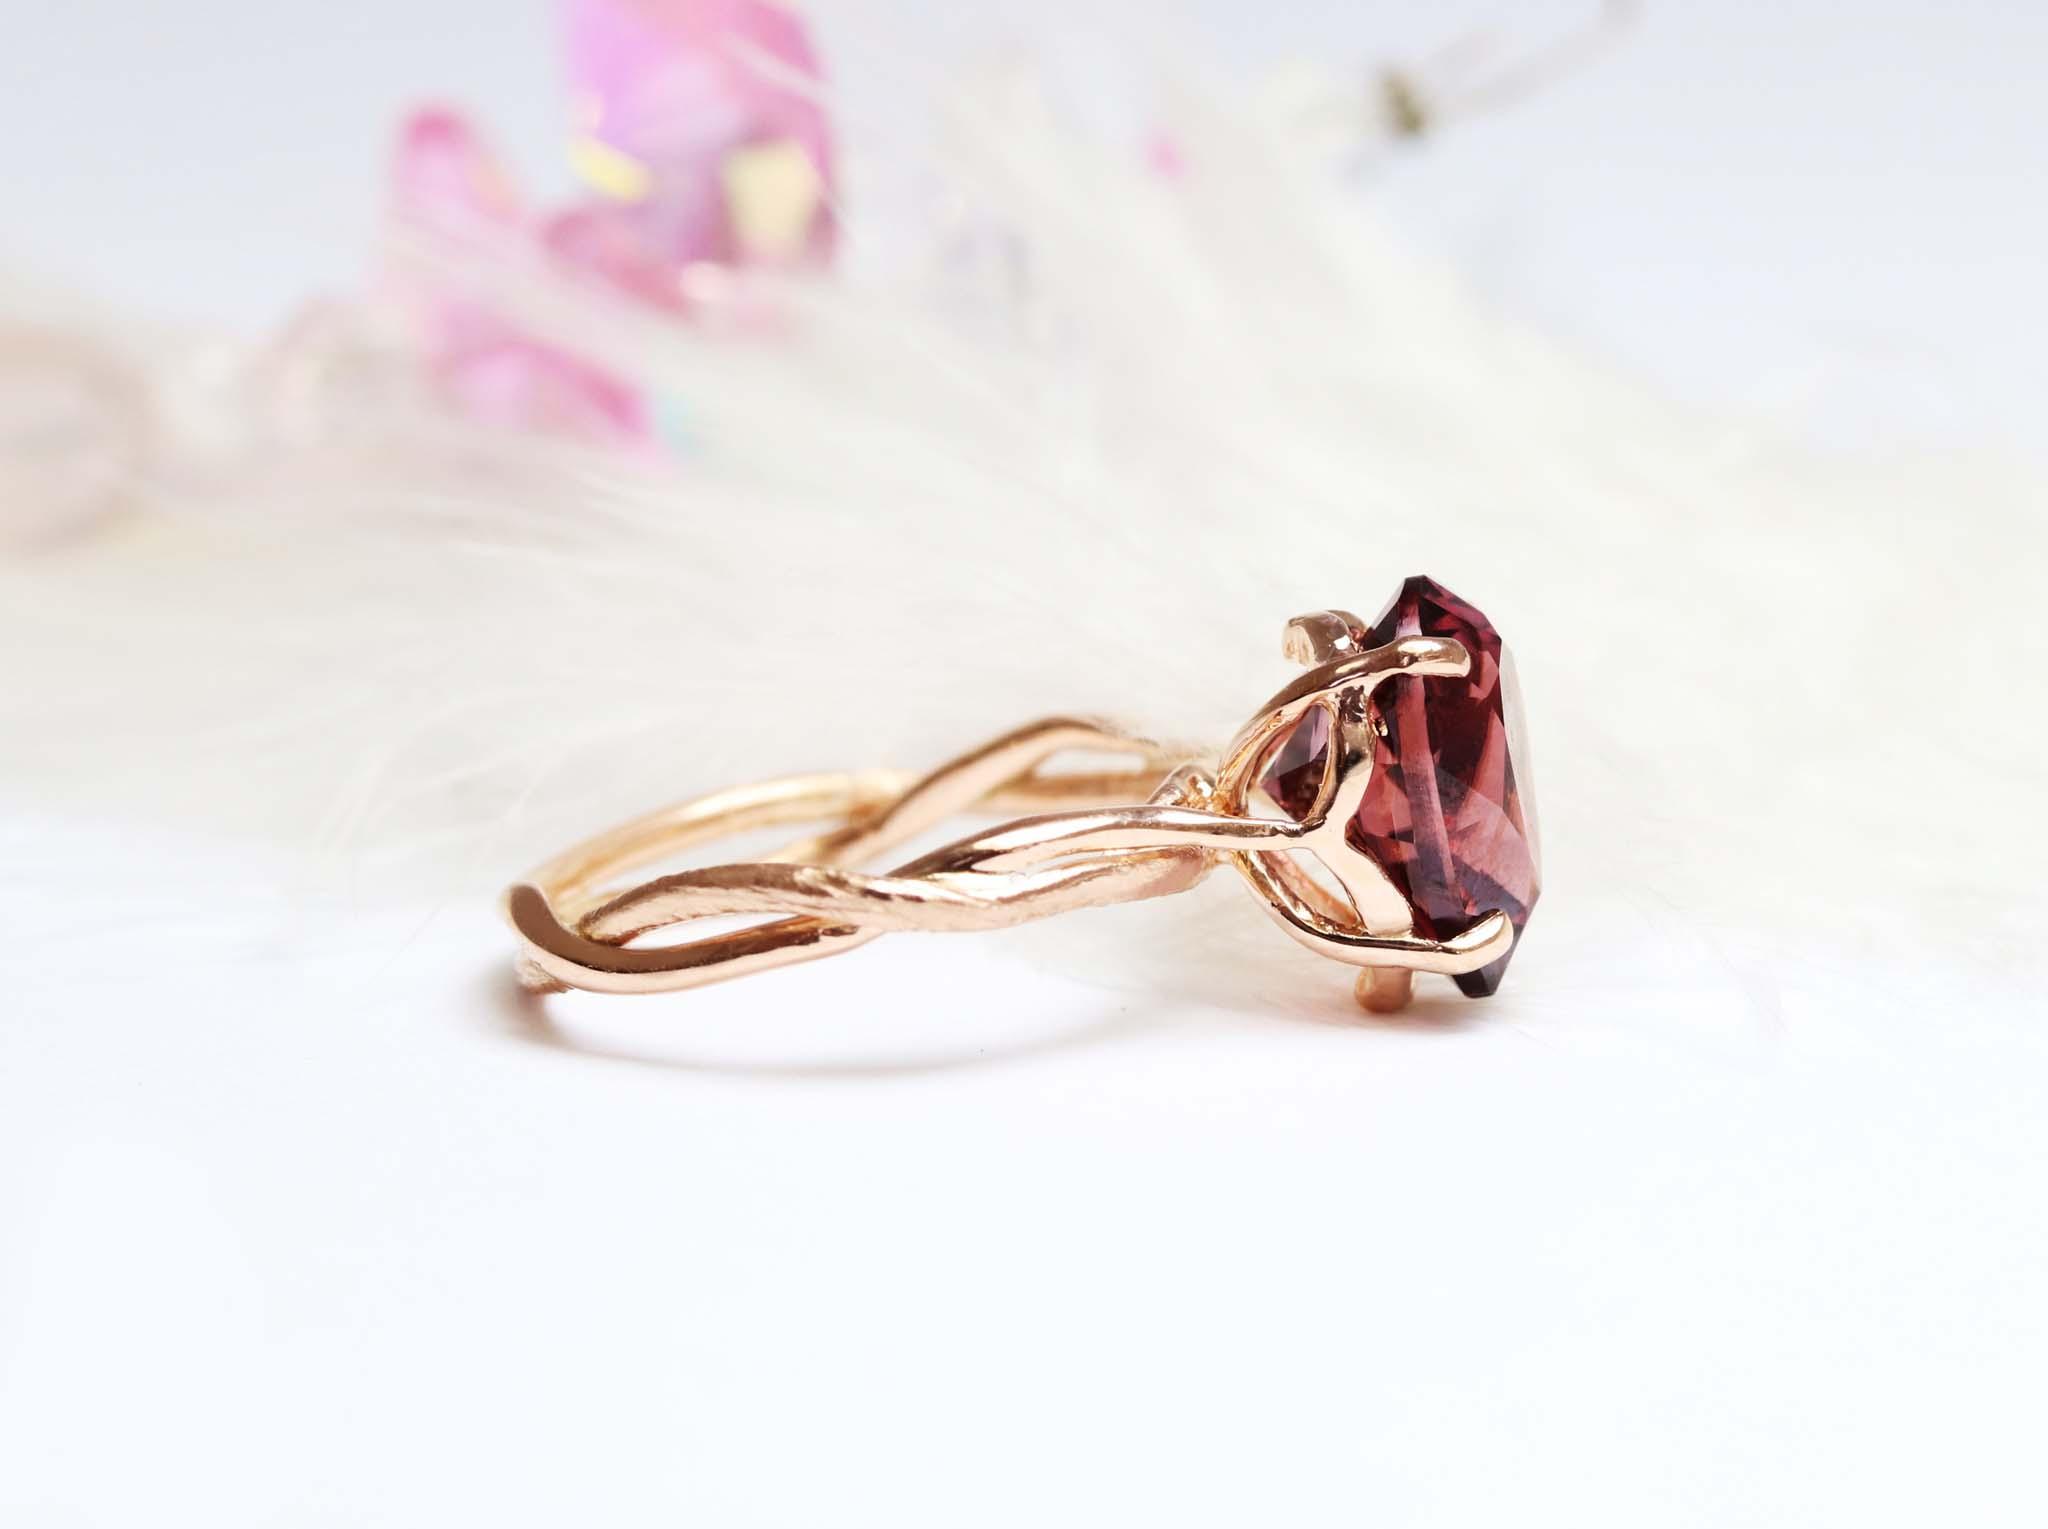 Vendor of the Week - Zoe Pook Jewellery - Polka Dot Wedding